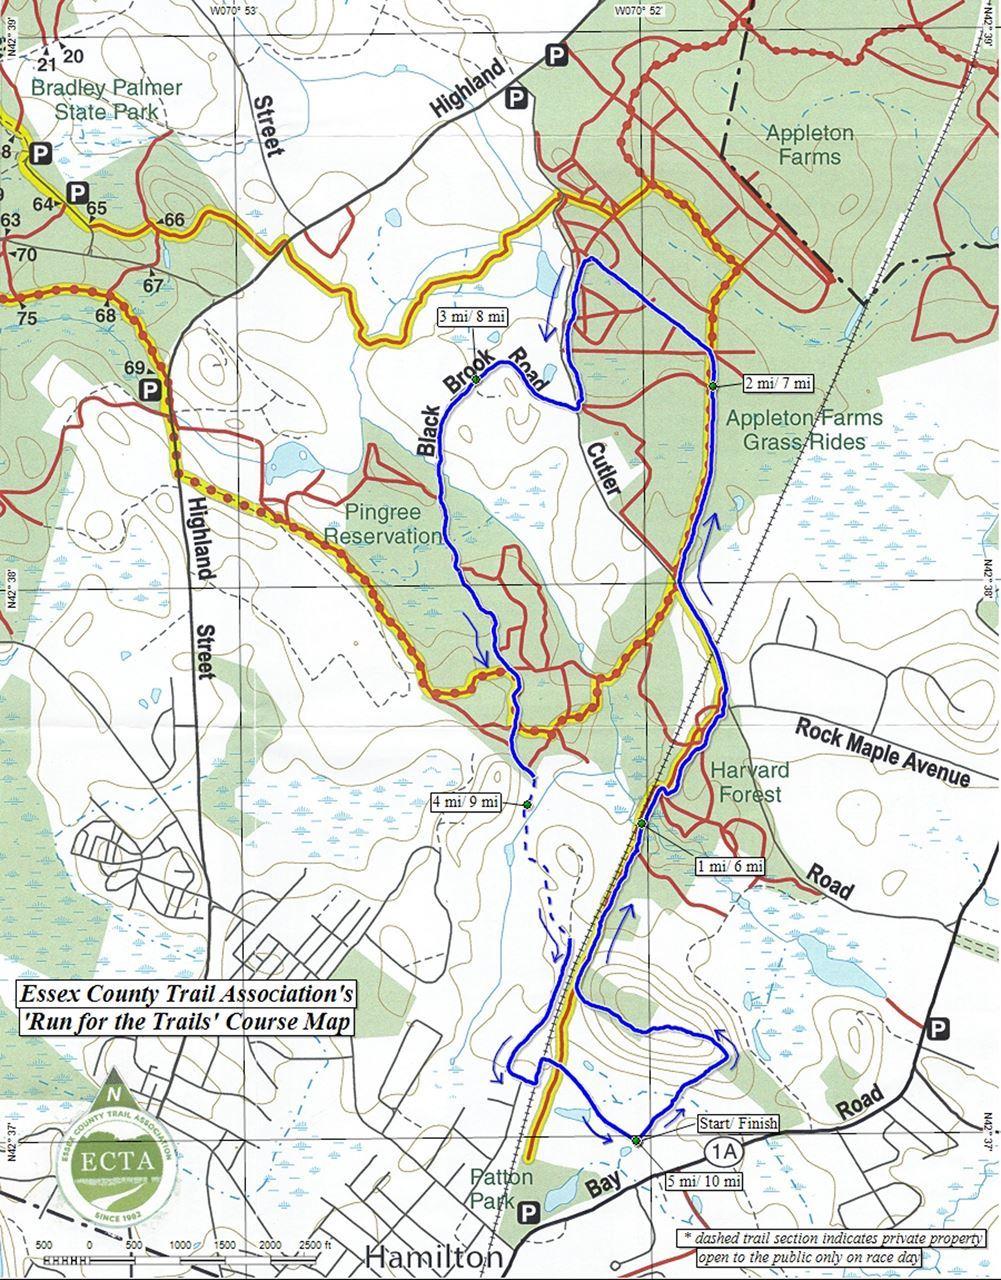 58d2bc13f0a92 ECTA - 14th Annual Run for the Trails